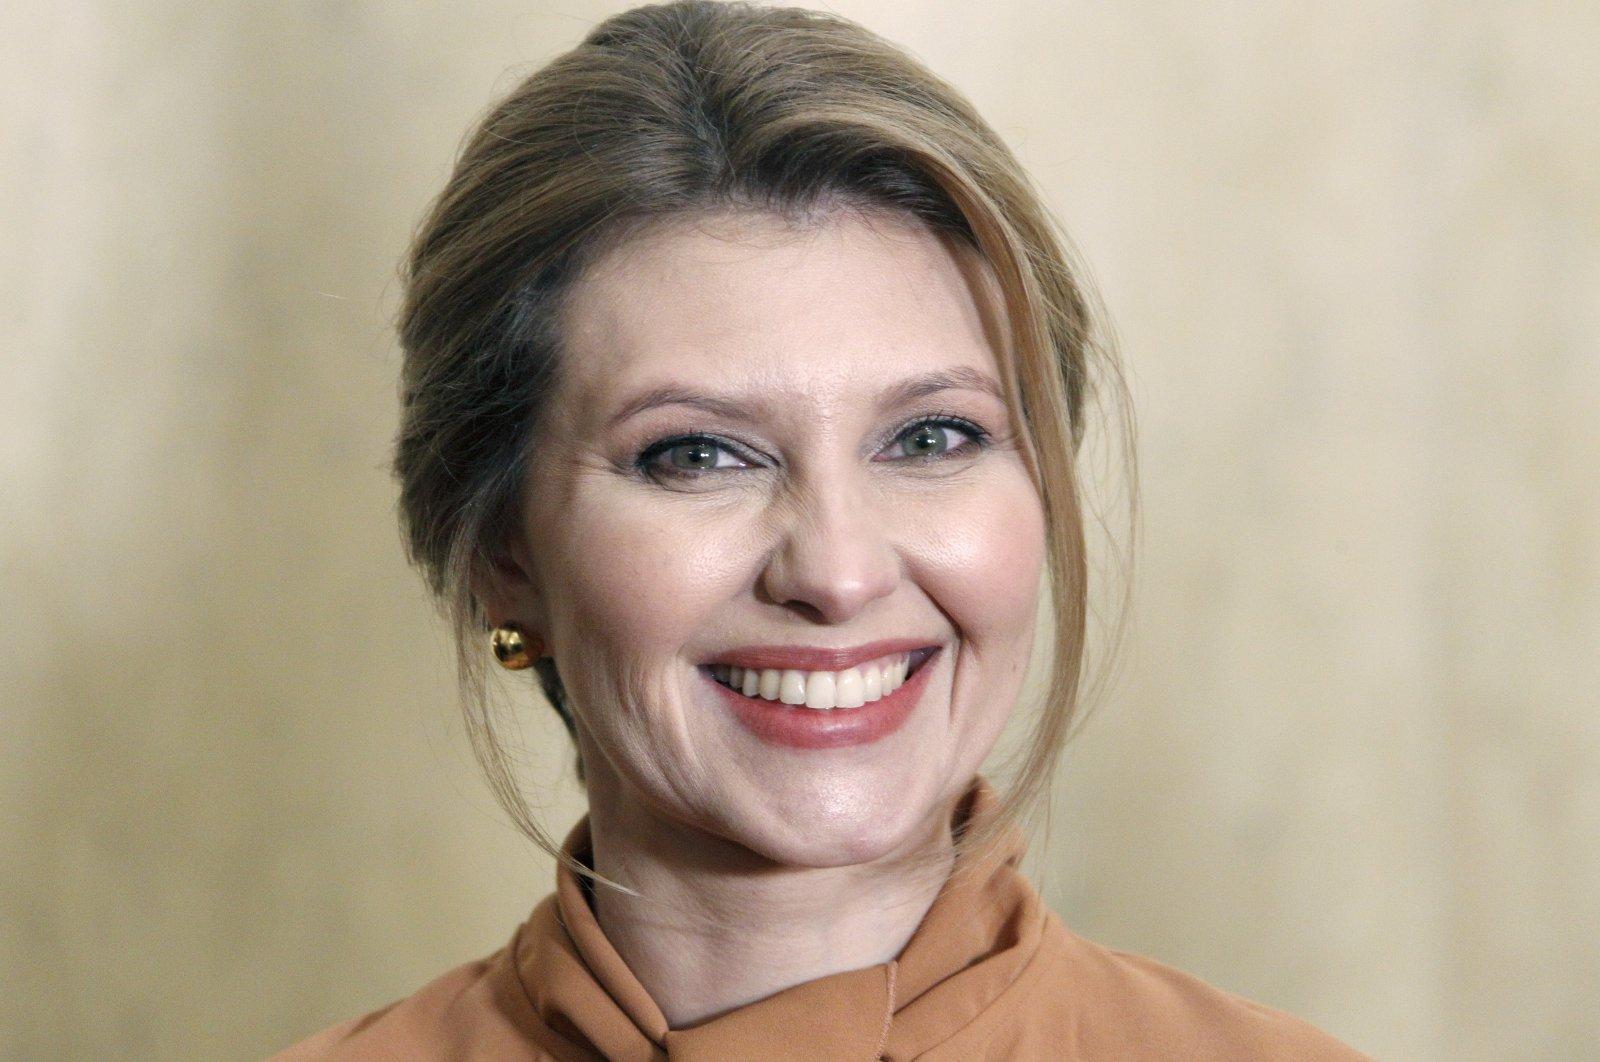 Ukraine's First Lady Olena Zelenska poses for photos during a welcoming ceremony in Tallinn, Estonia, Nov. 26, 2019. (EPA-EFE Photo)